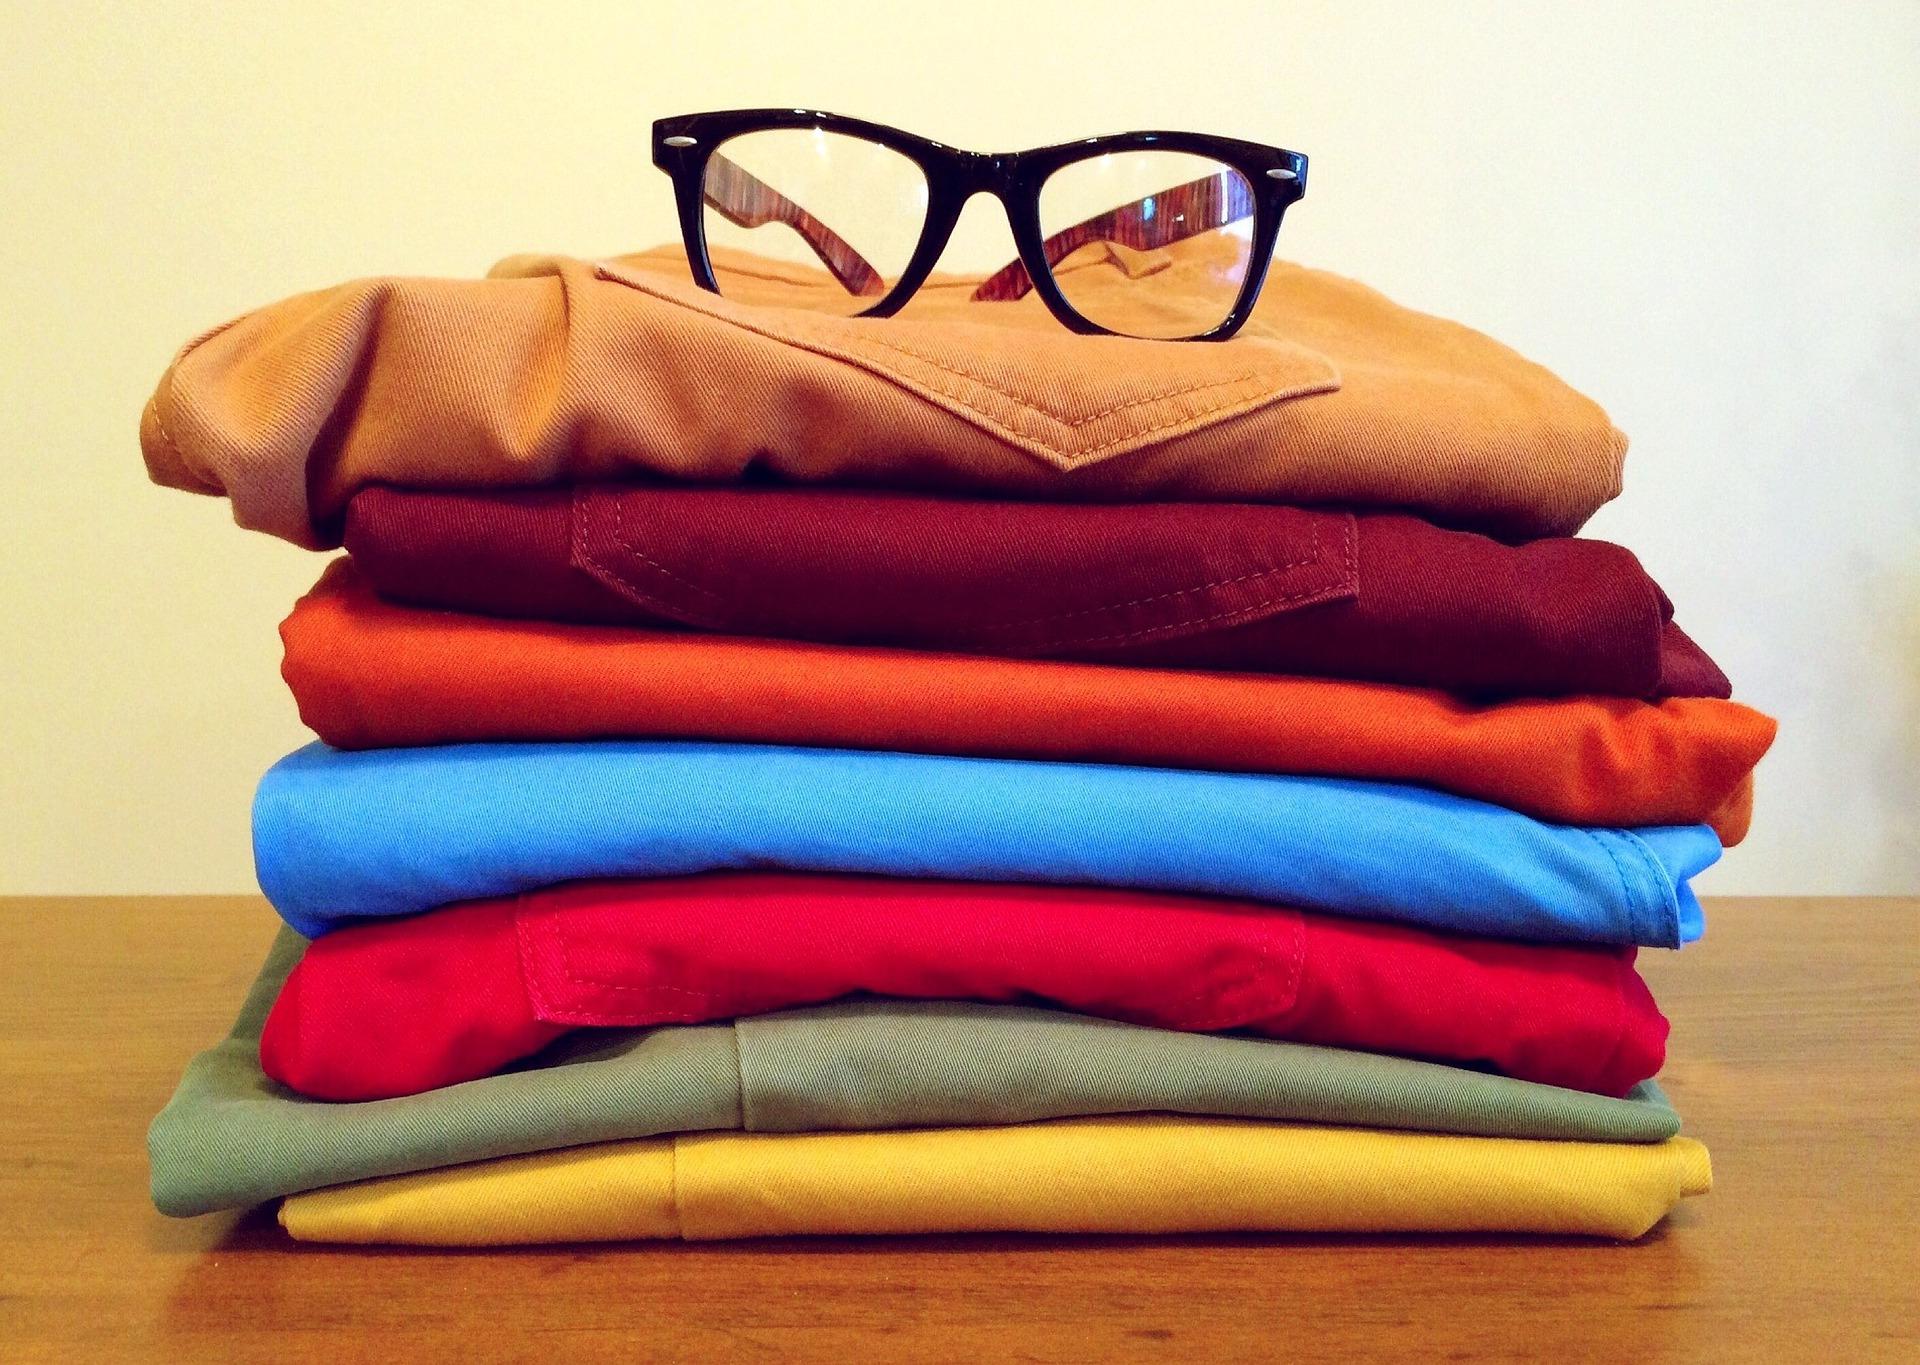 5ad9f3be97e9aa Kleidung online verkaufen zum Festpreis - Bonavendi.de